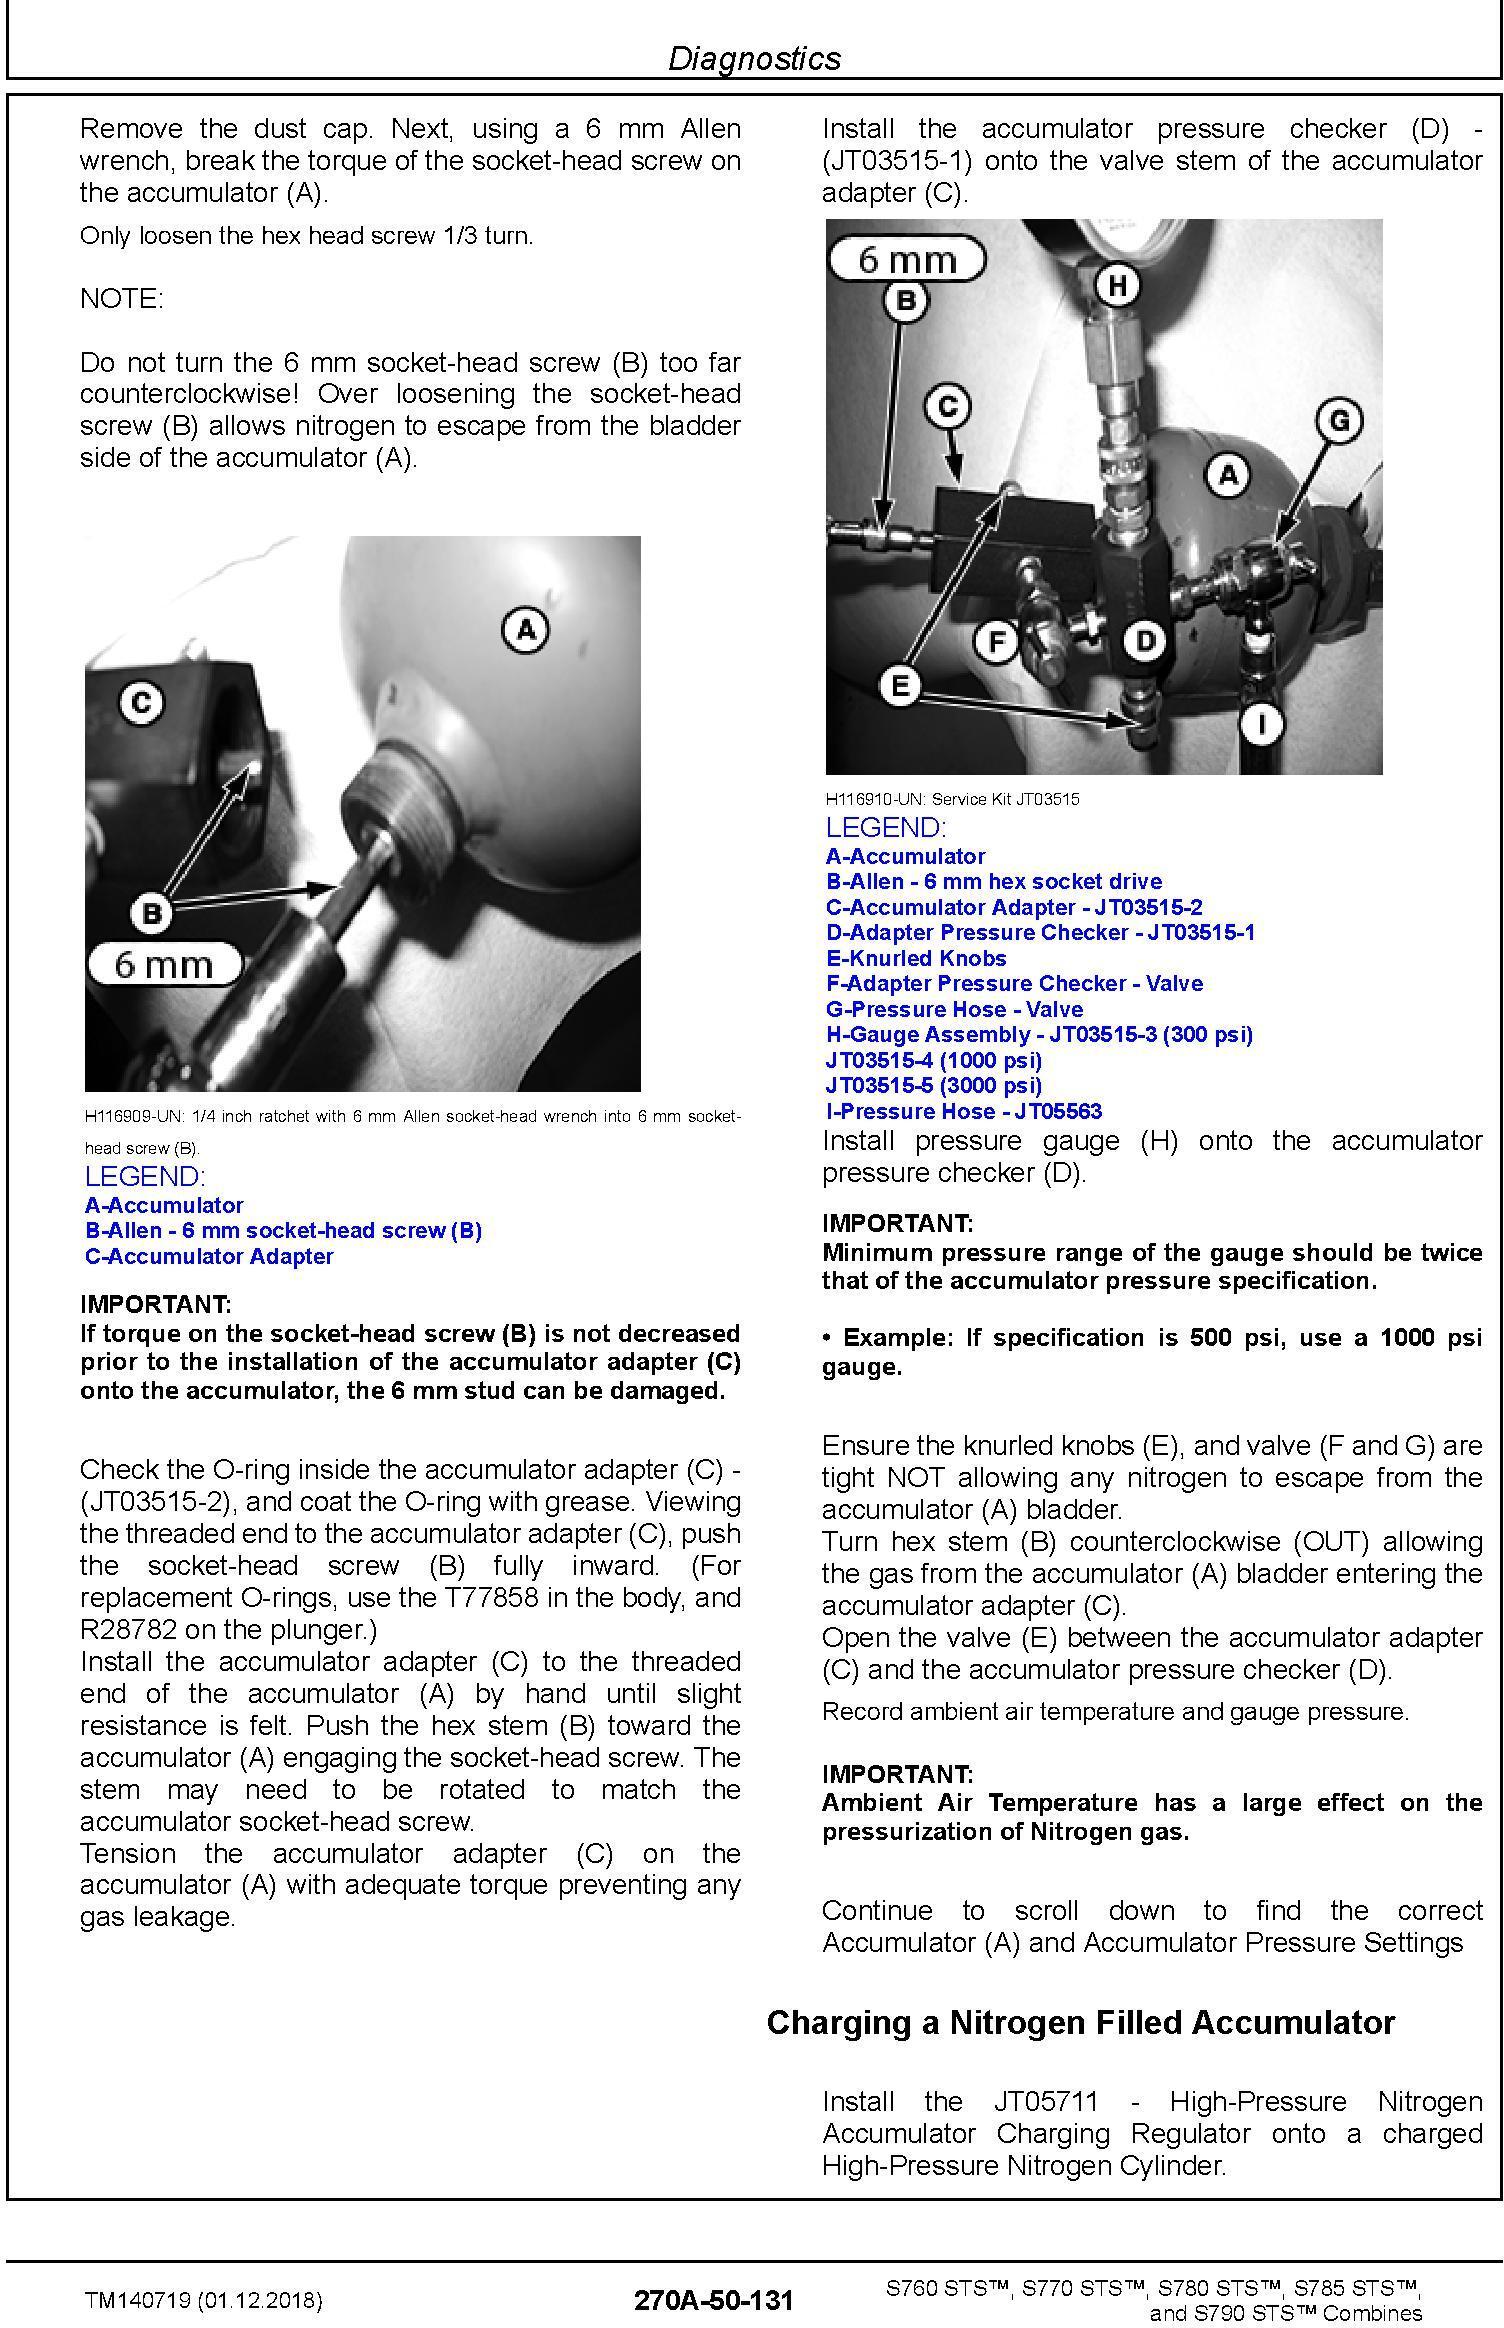 John Deere S760, S770, S780, S785, S790 STS Combines Diagnostic Technical Service Manual (TM140719) - 2